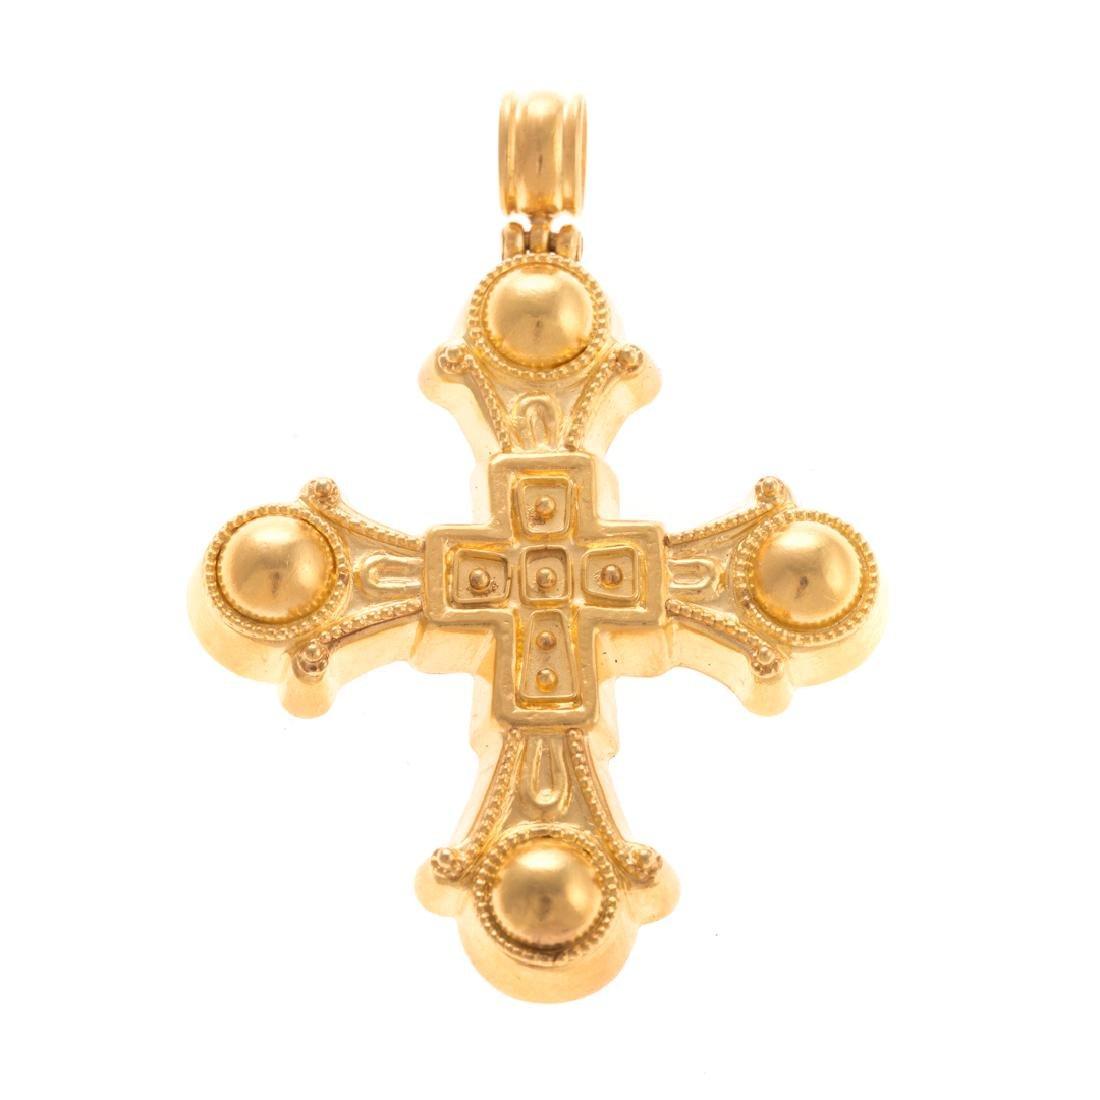 A Lady's 22K Maltese Cross Pendant